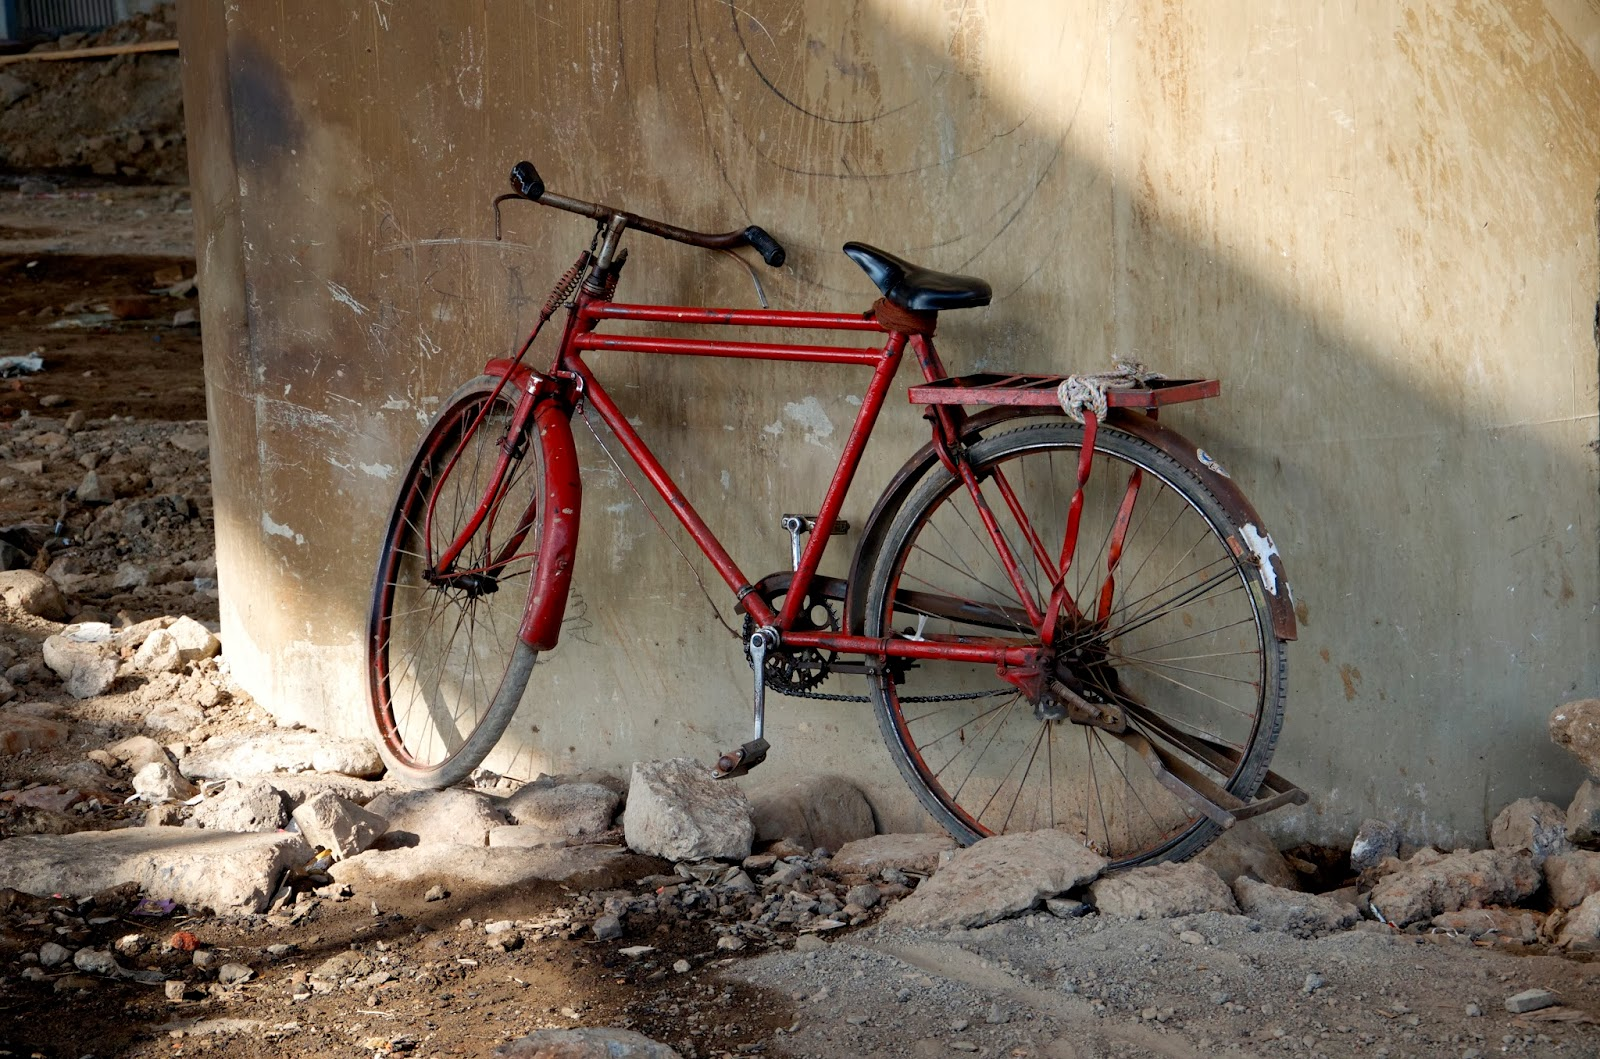 Ubiquitous India No 3 The Hercules Bicycle